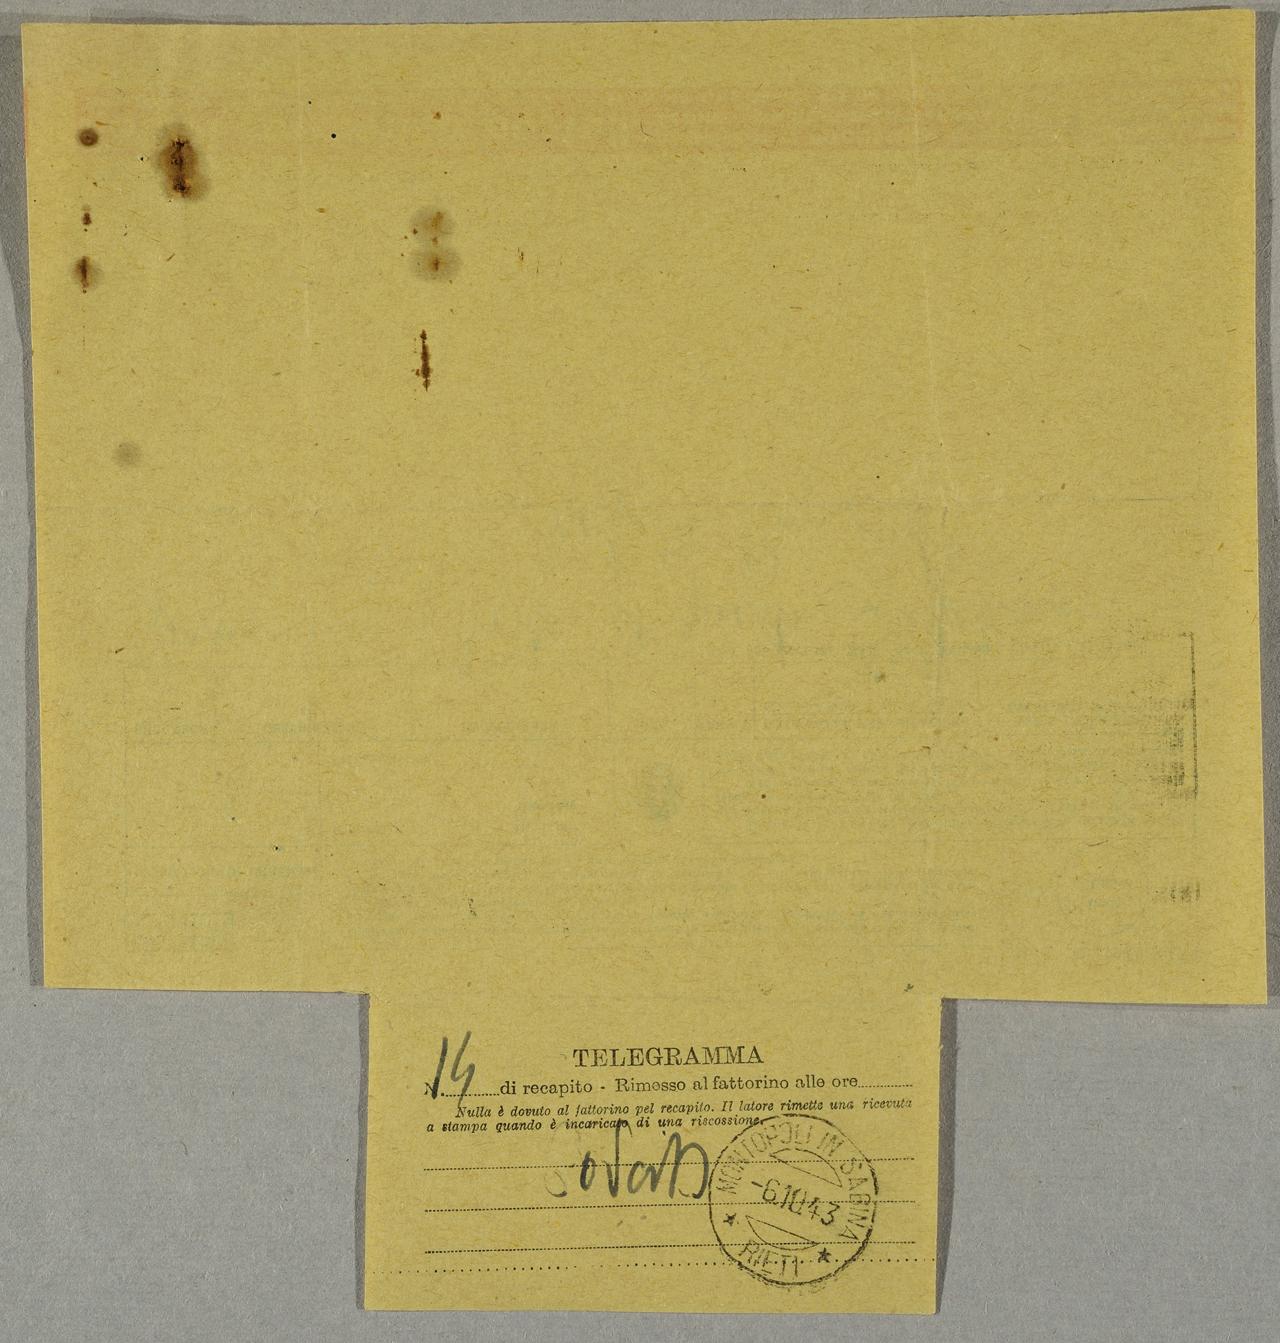 Comune Di Montopoli Di Sabina telegramma   storie e microstorie bassa sabina 1914 – 1946